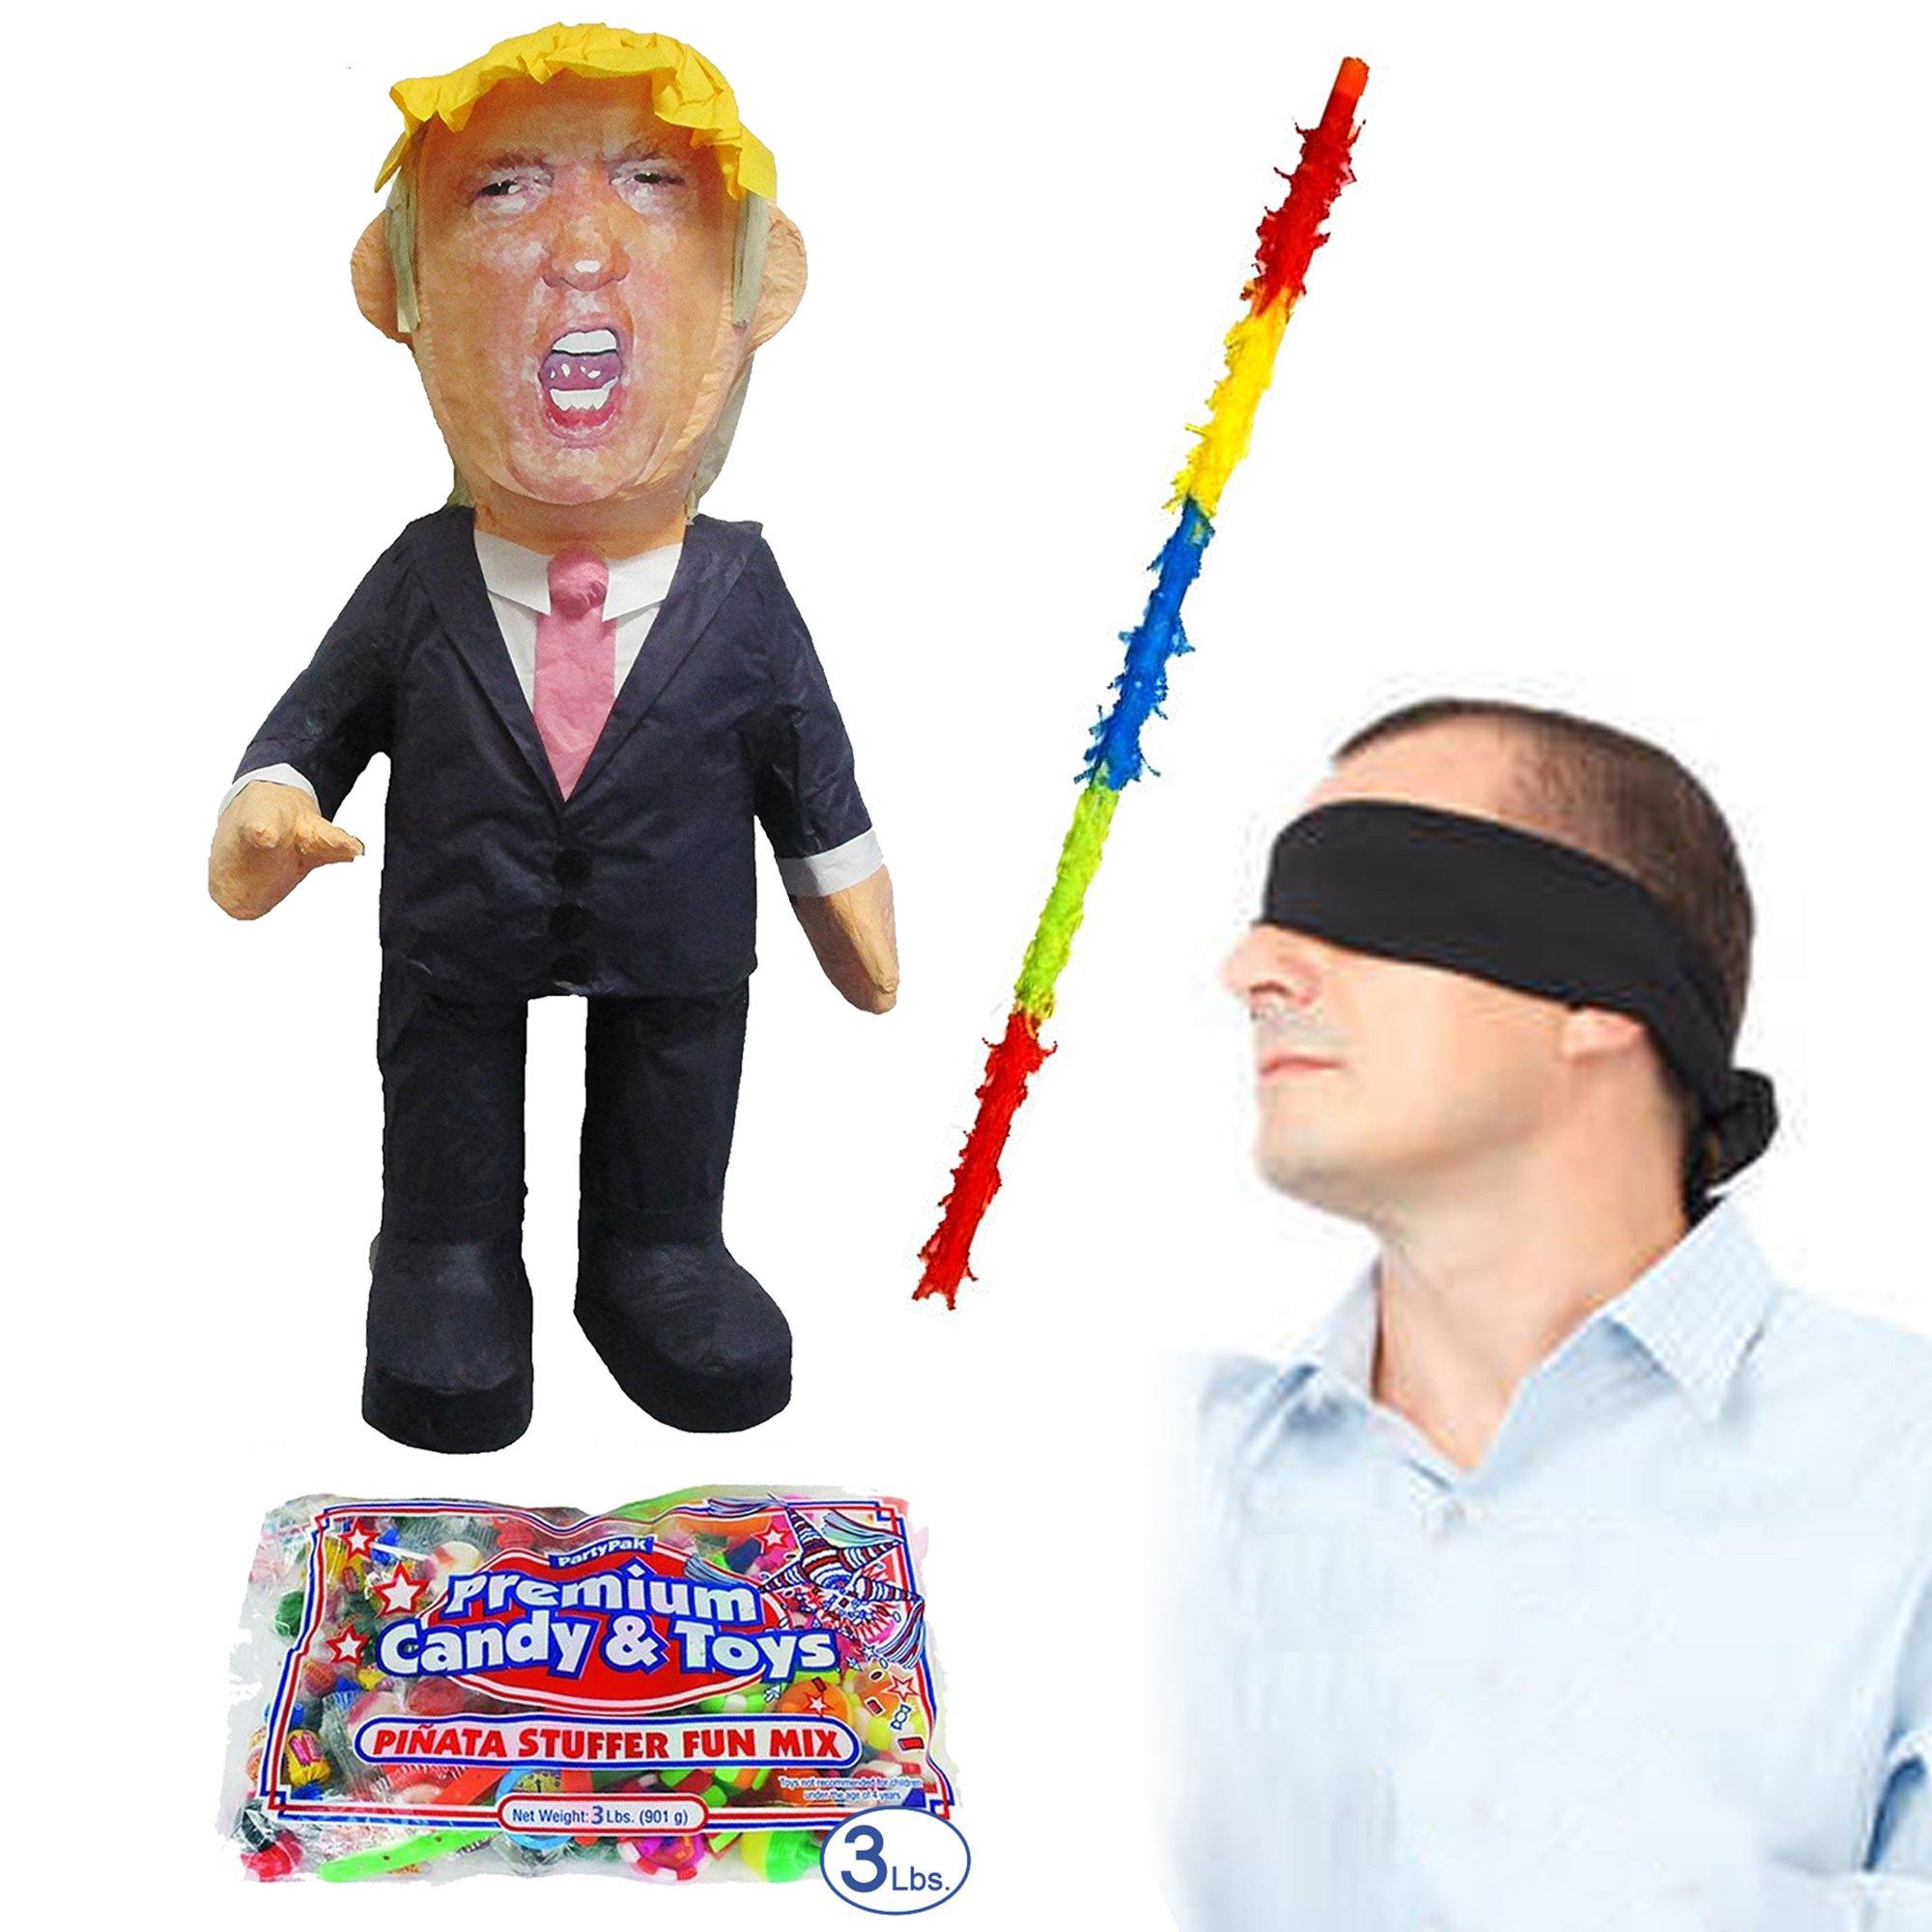 Donald Trump Pinata Kit Including Pinata, Buster Stick, Bandana and 3 lbs. Candy Filler